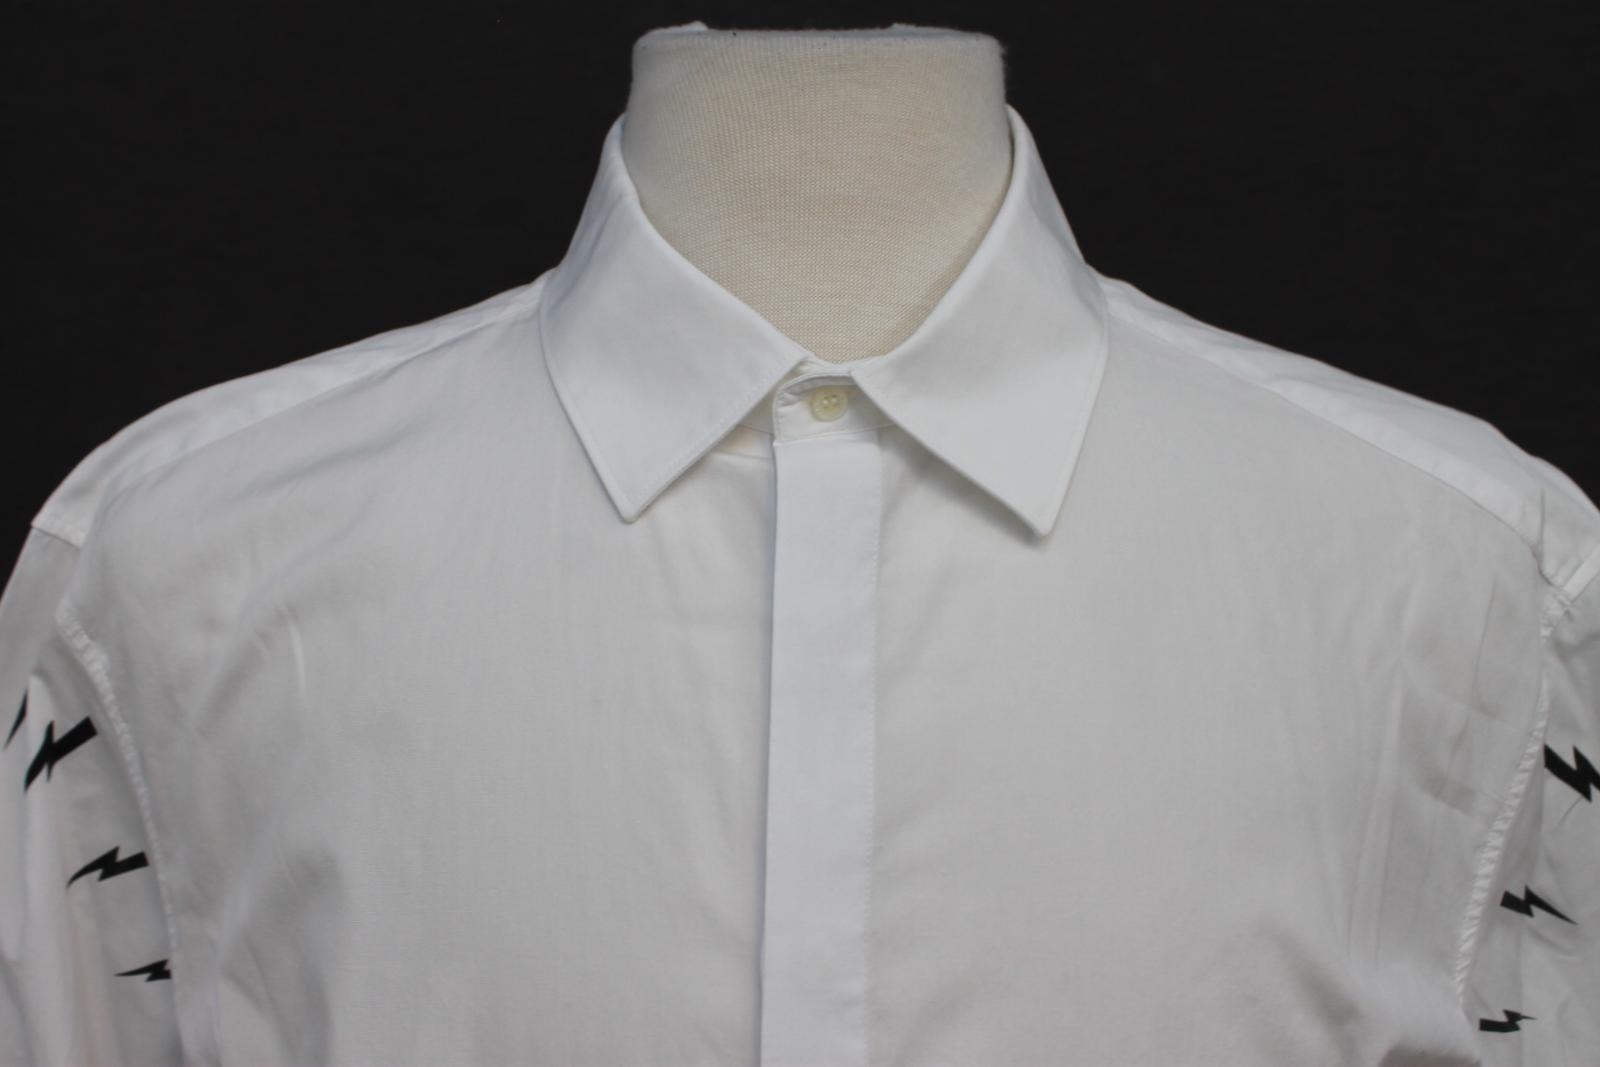 Neil-barrett-hombre-blanco-de-algodon-manga-de-Rayo-con-cuello-camisa-tamano-17-5-034 miniatura 3